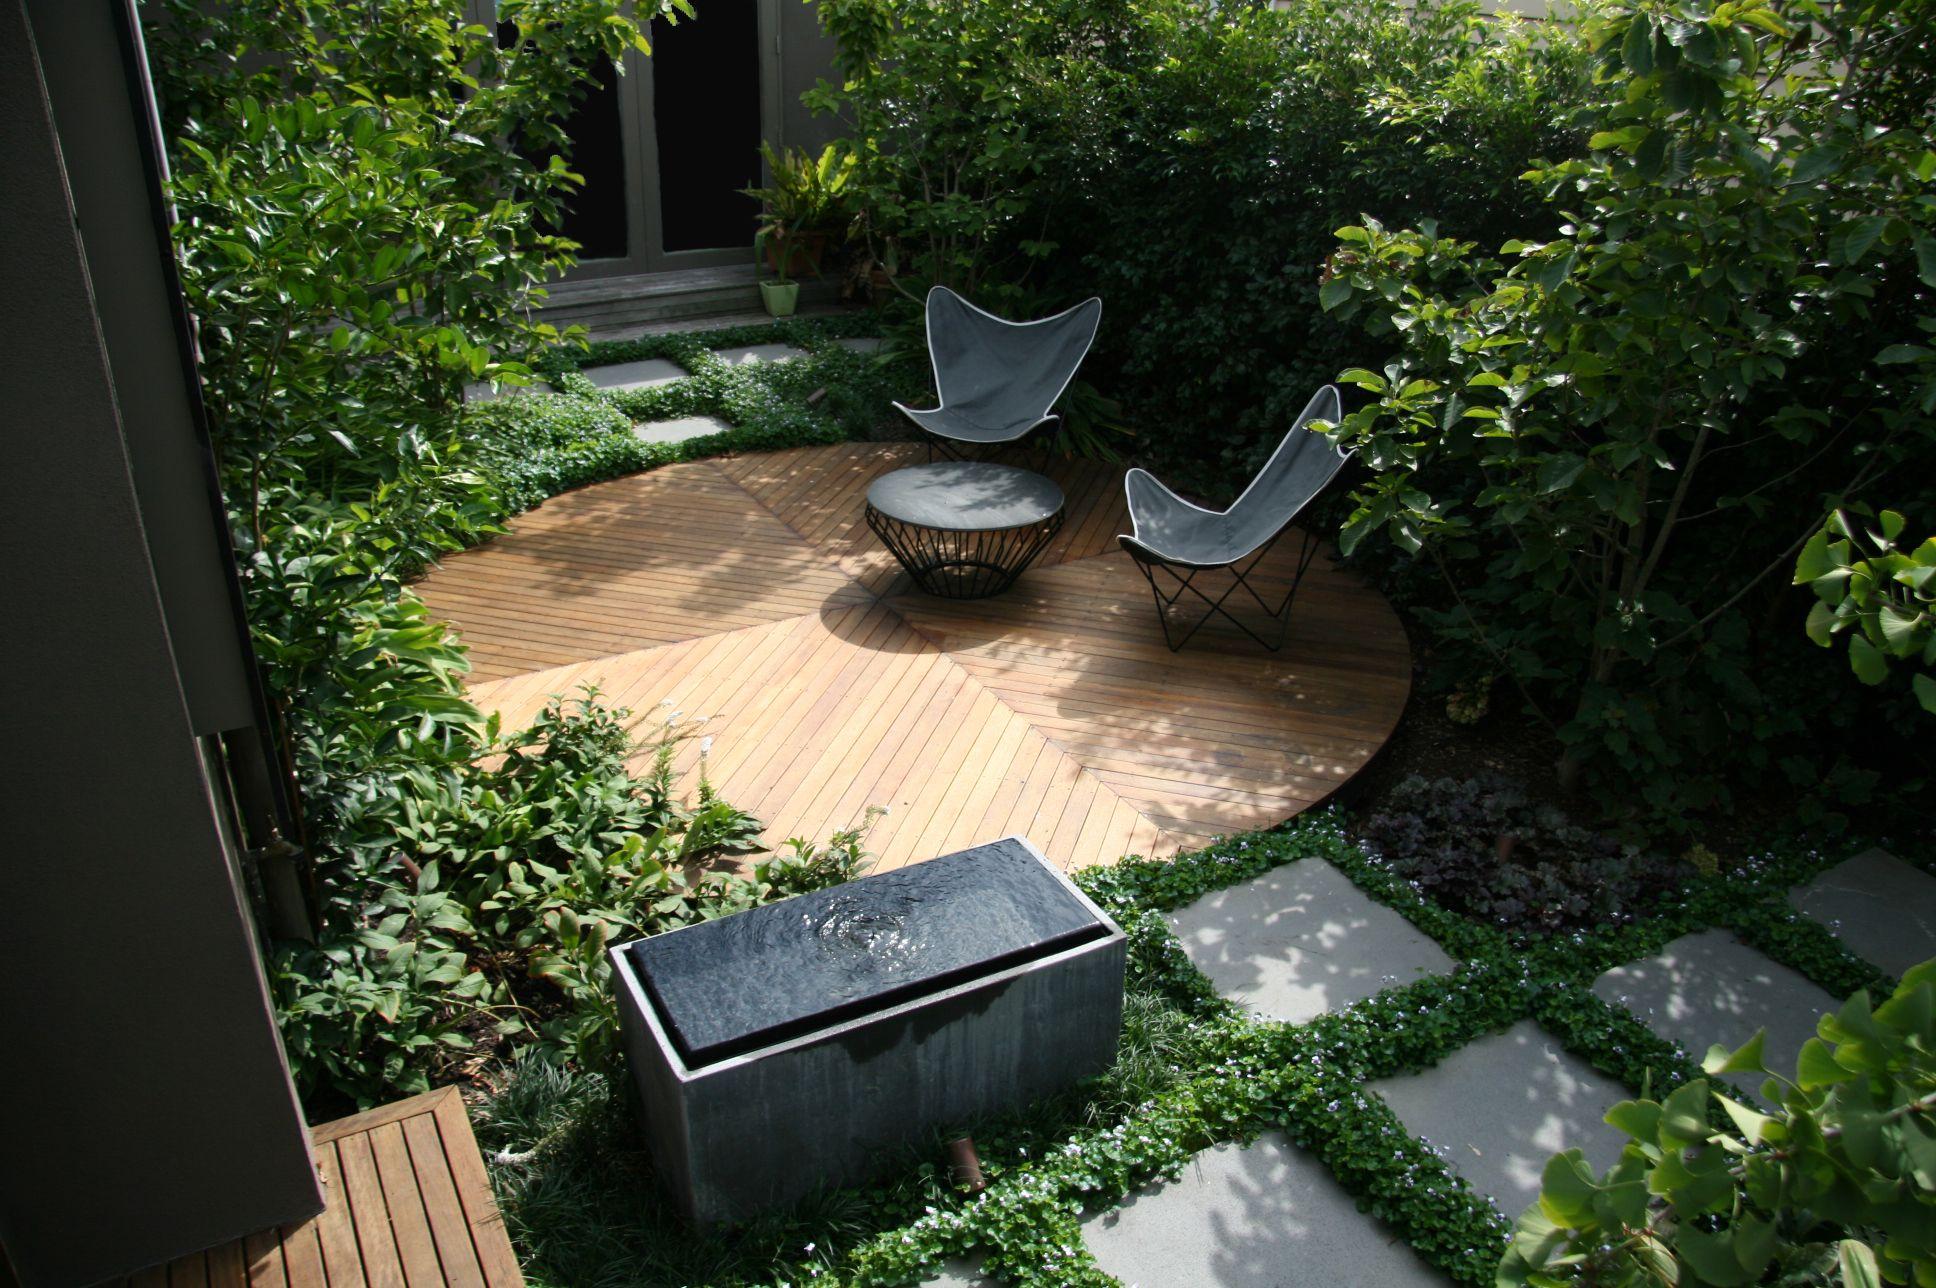 Garden Design Maitland St Small Courtyard Gardens Backyard Seating Area Modern Patio